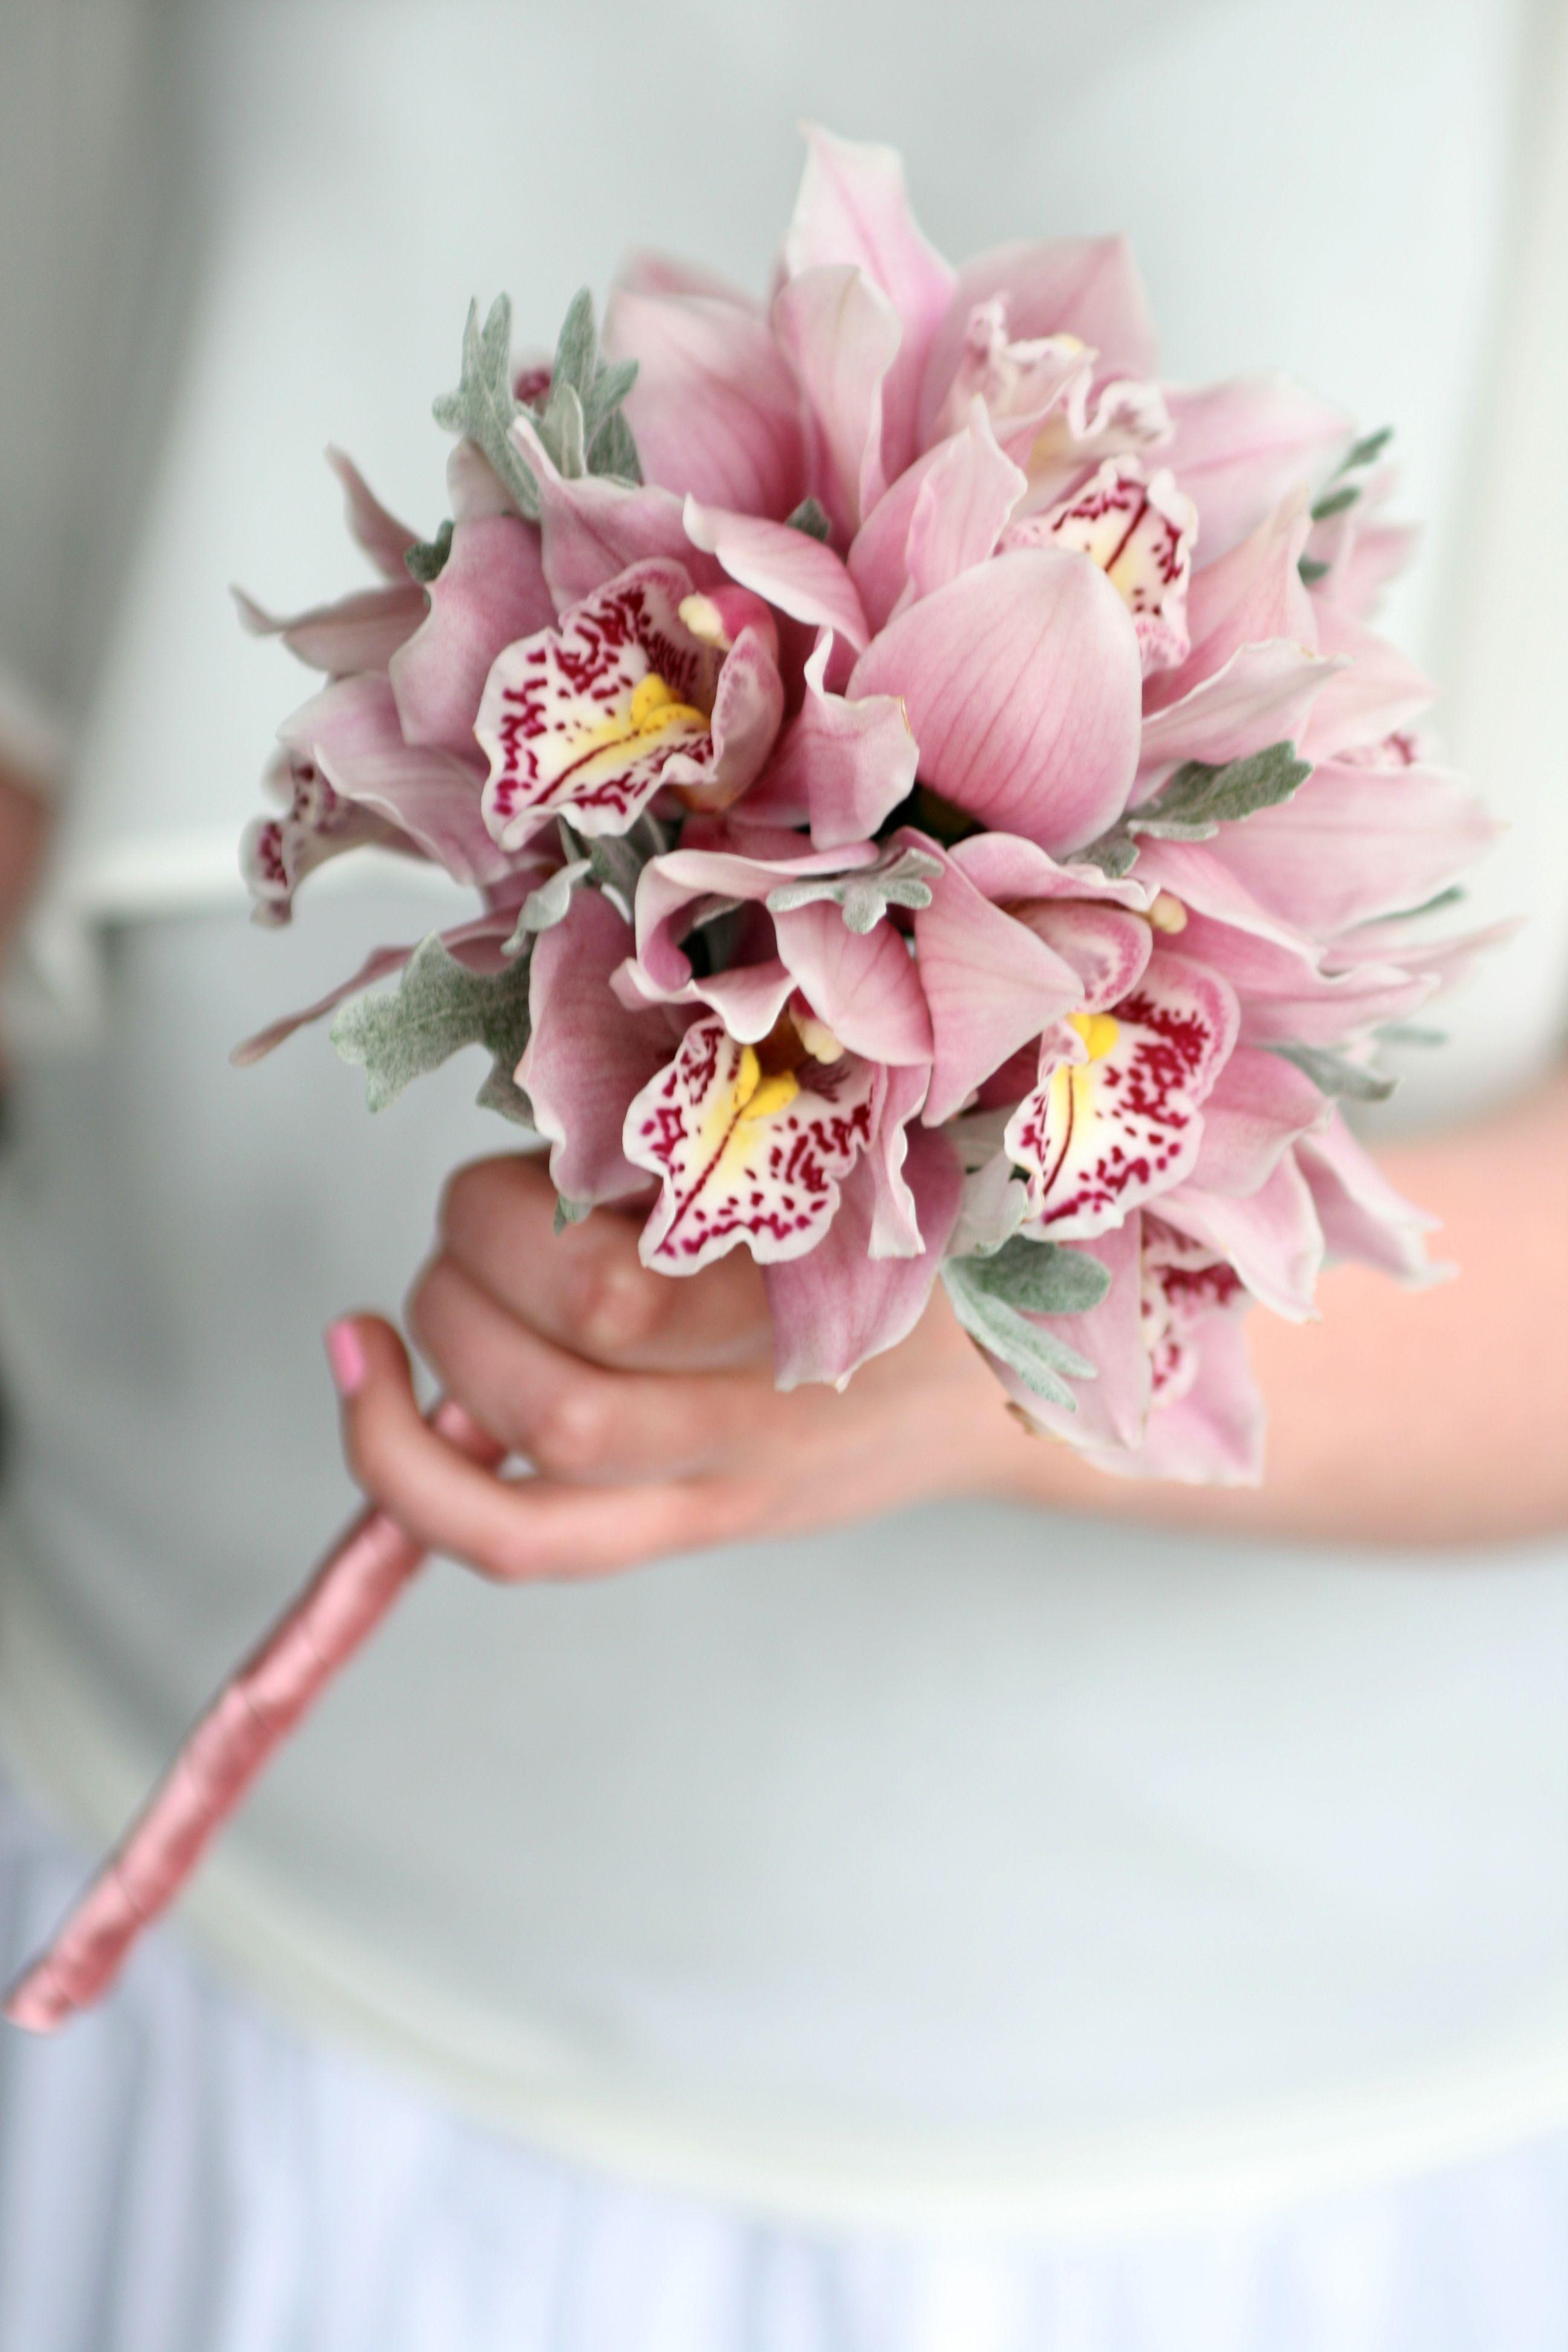 Flower girl wand of cymbidium orchids and silver senecio foliage ...